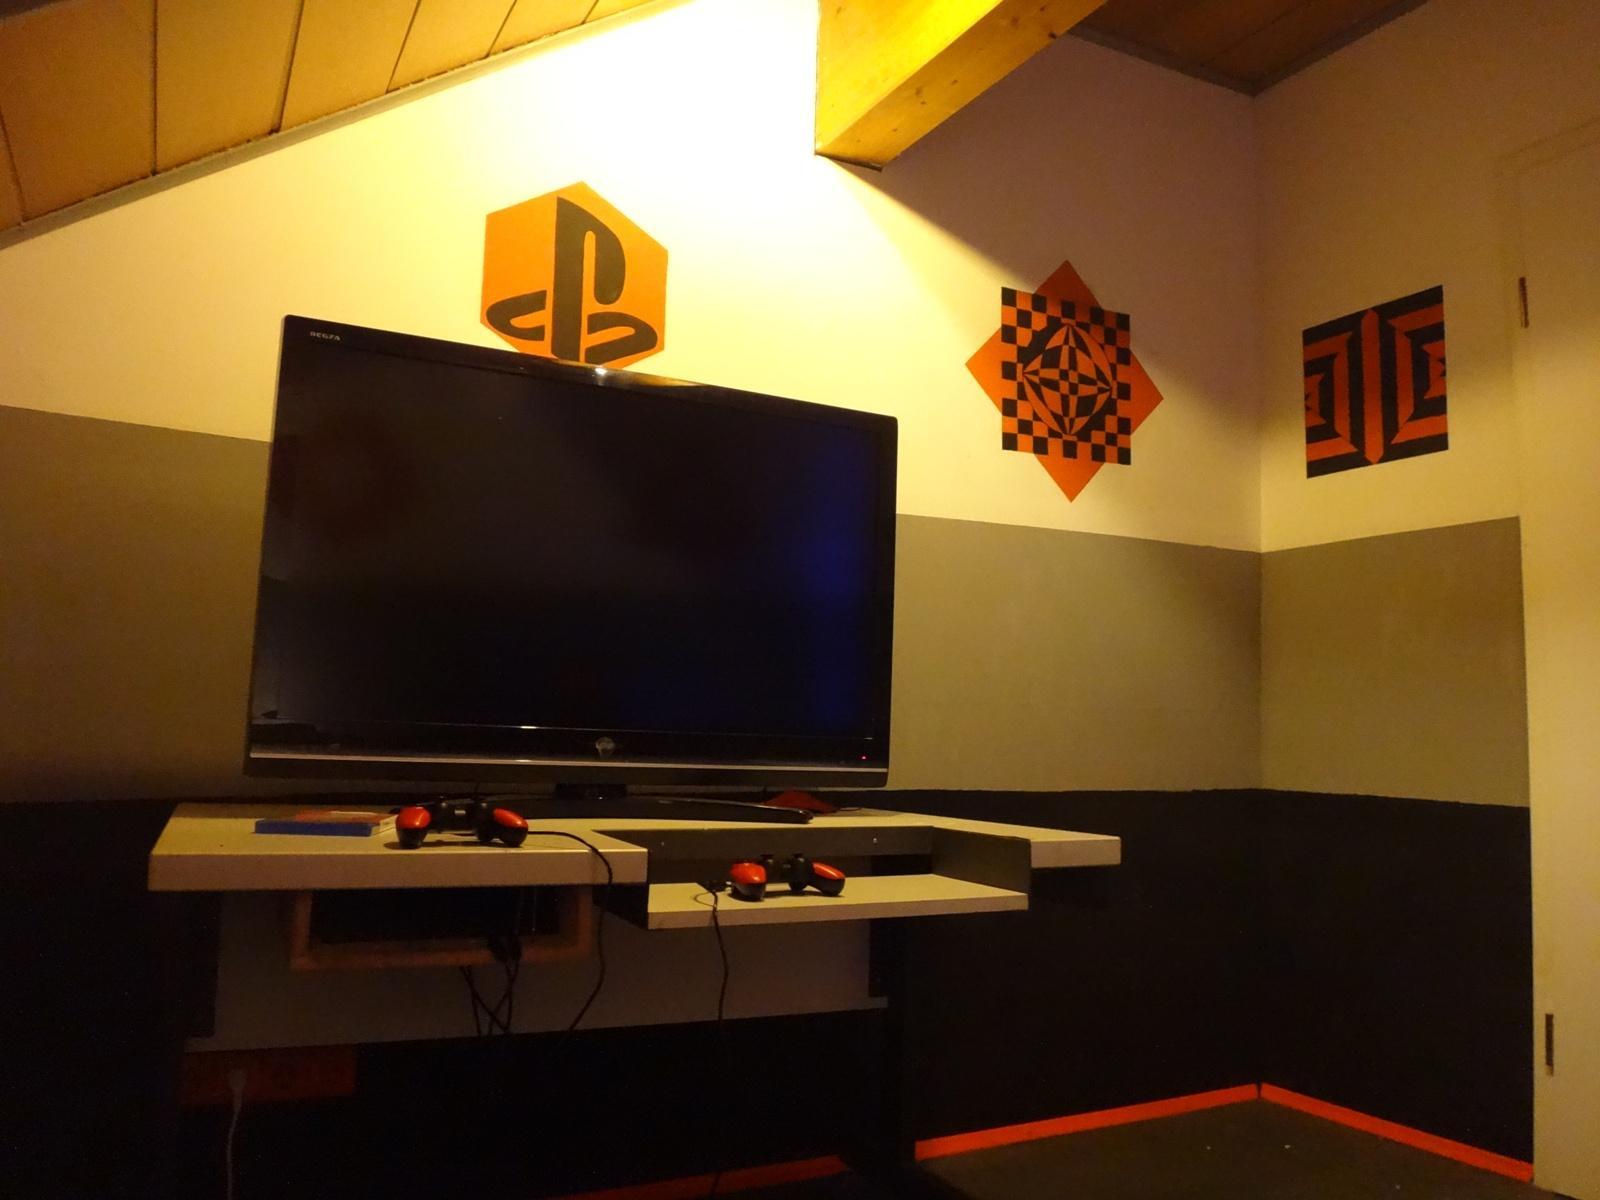 Playstationzimmer